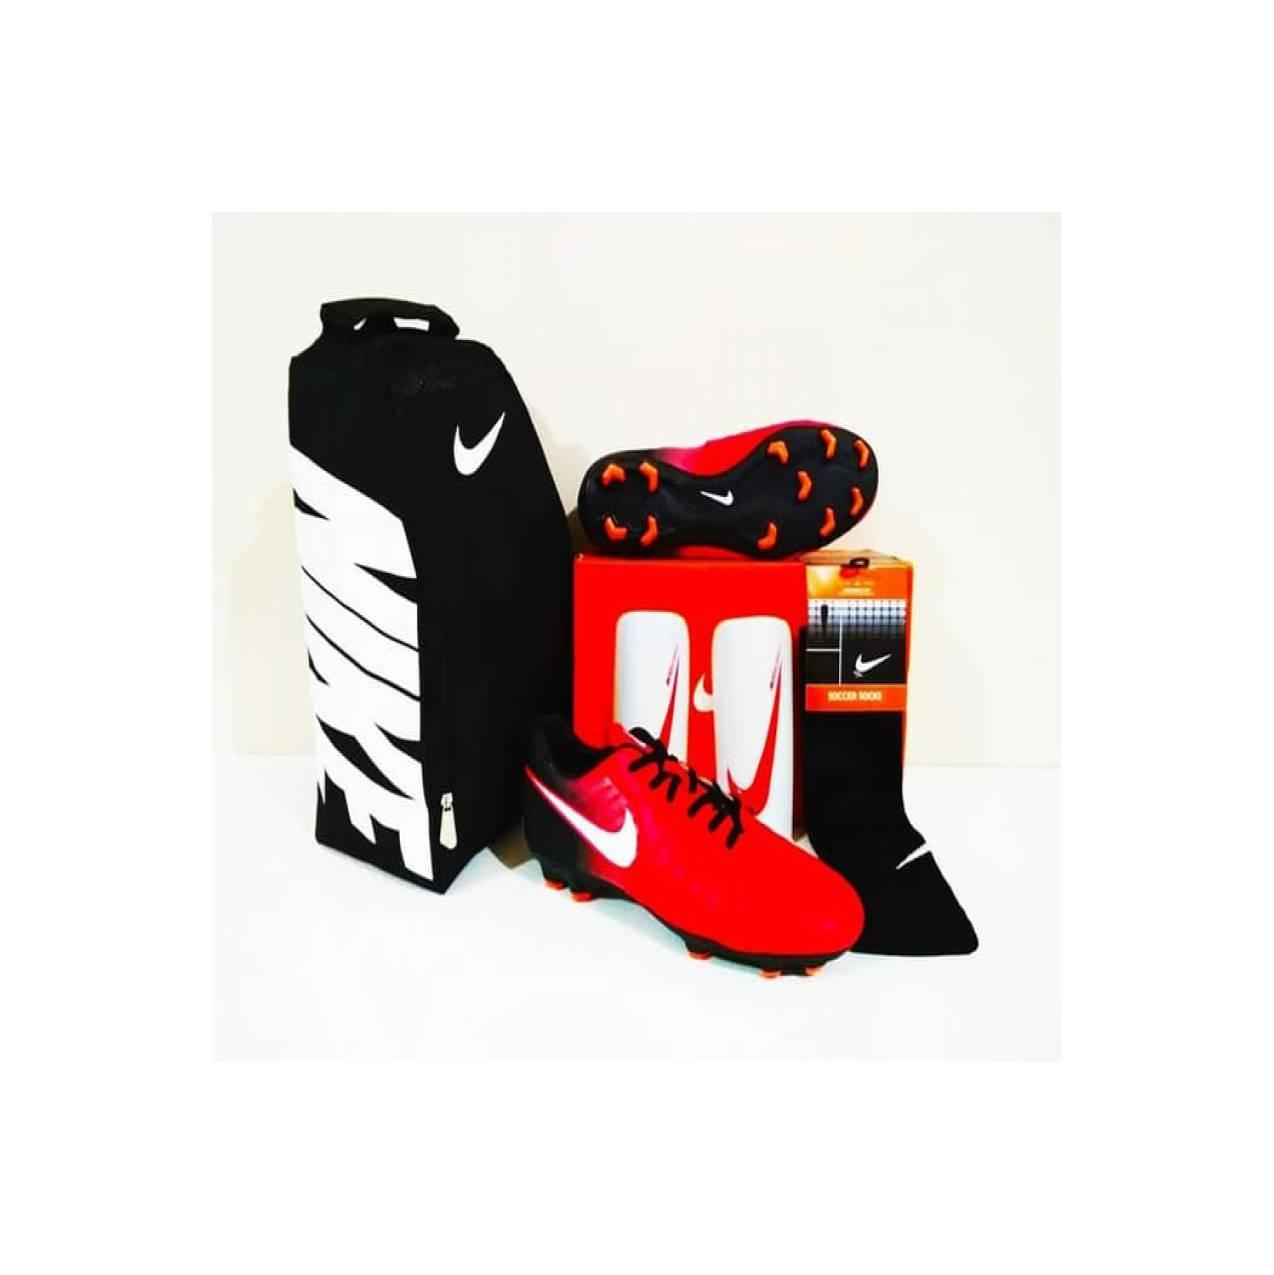 PAKET EKONOMIS Murah. Sepatu Bola Tiempo Legacy FG Red Black